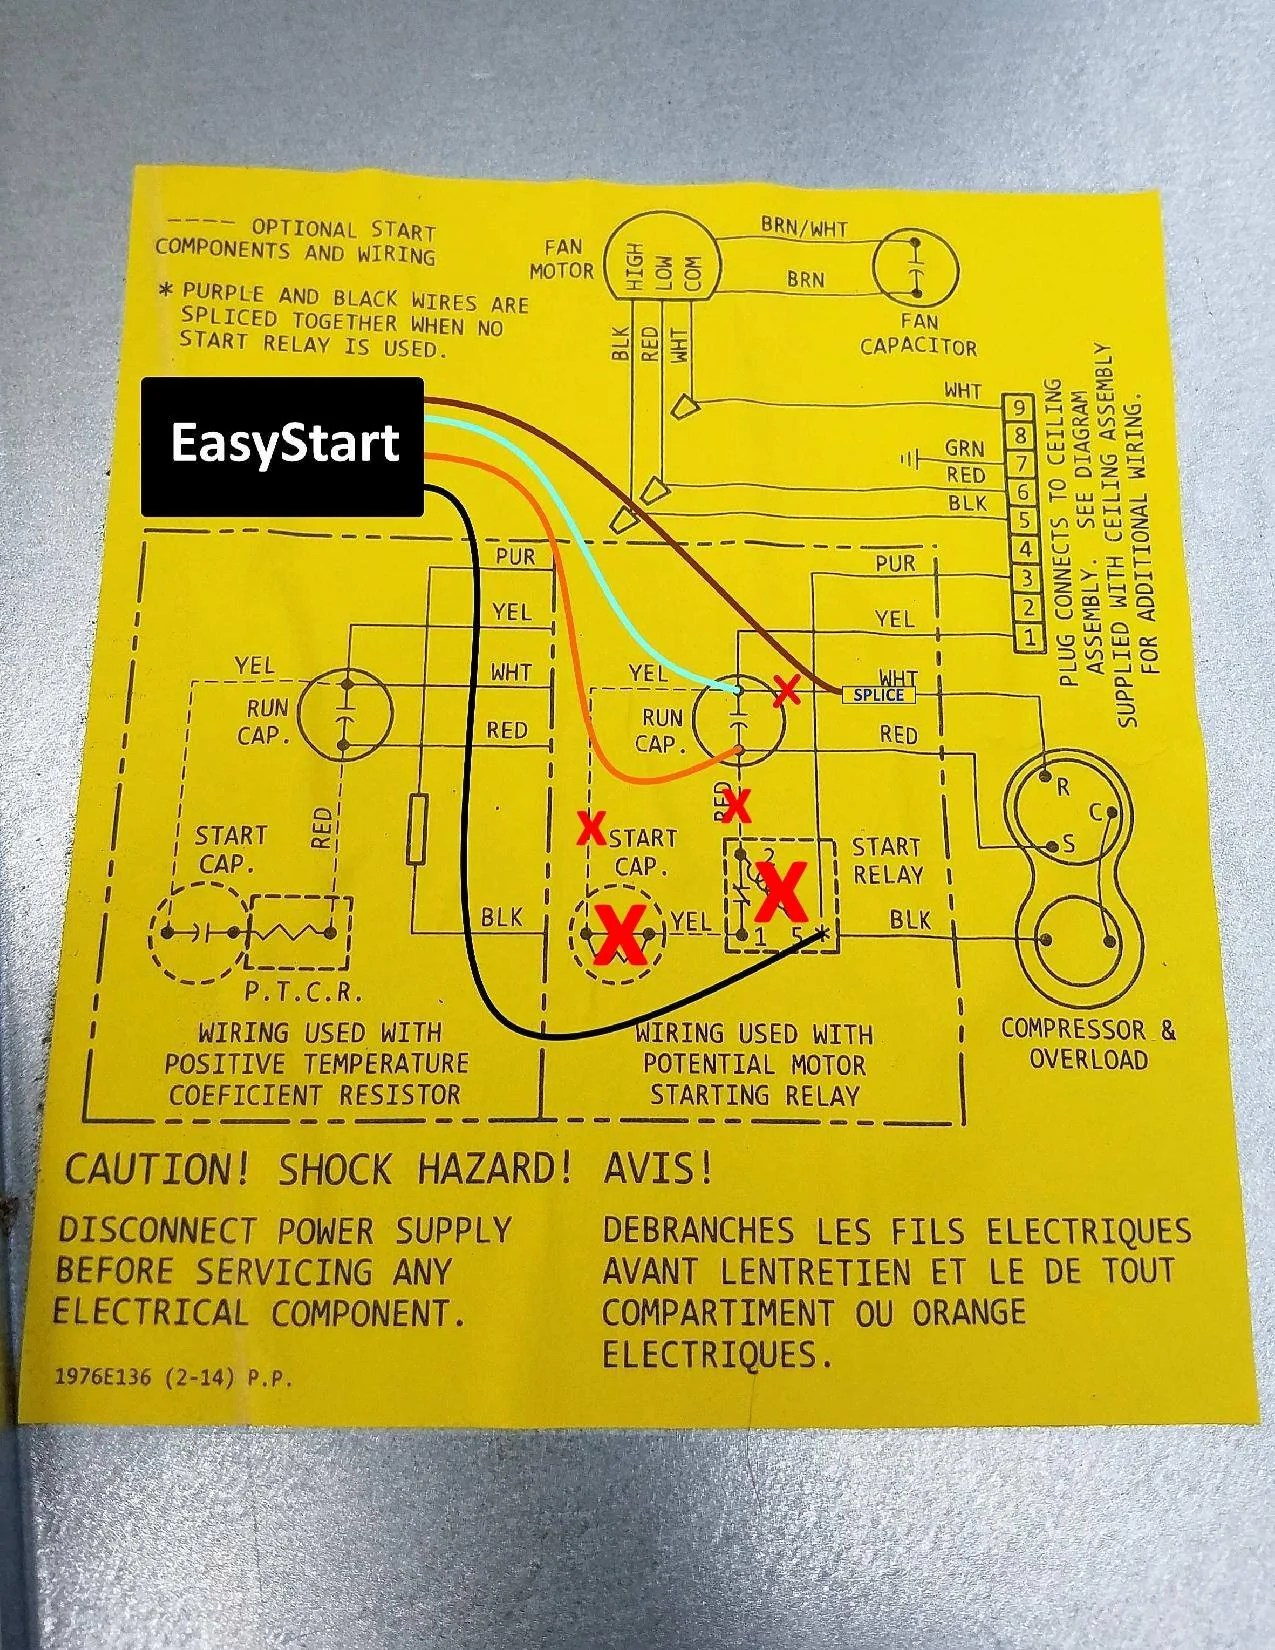 hight resolution of coleman mach 1 easystart 364 wiring diagram